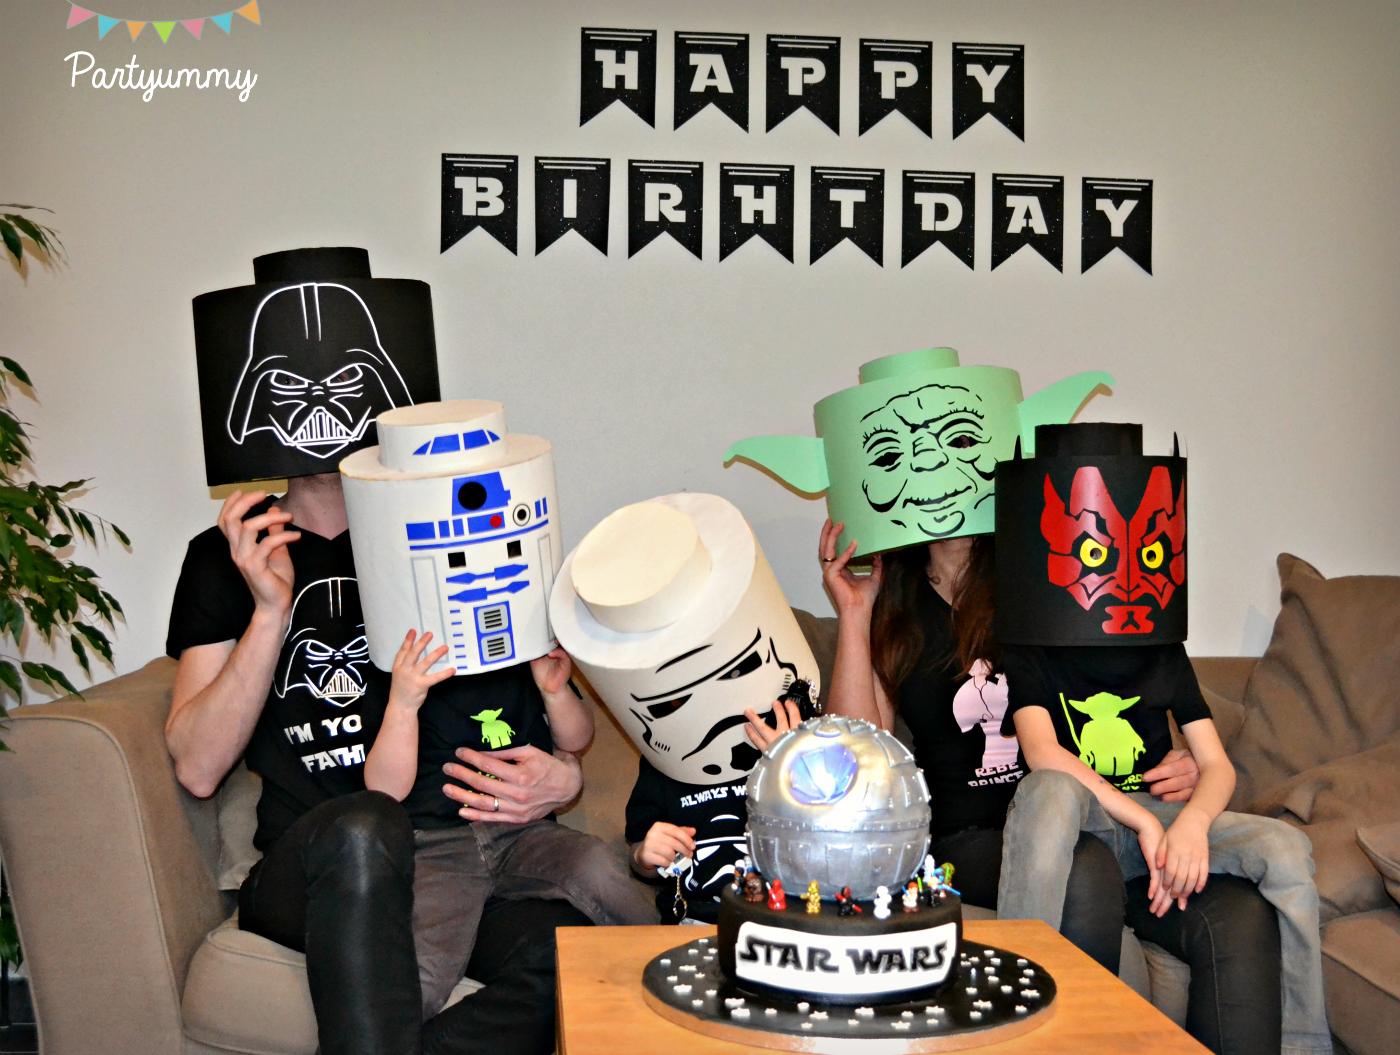 famille-lego-star-wars-deguisement-tete-vador-stormtrooper-r2d2-yoda-maul